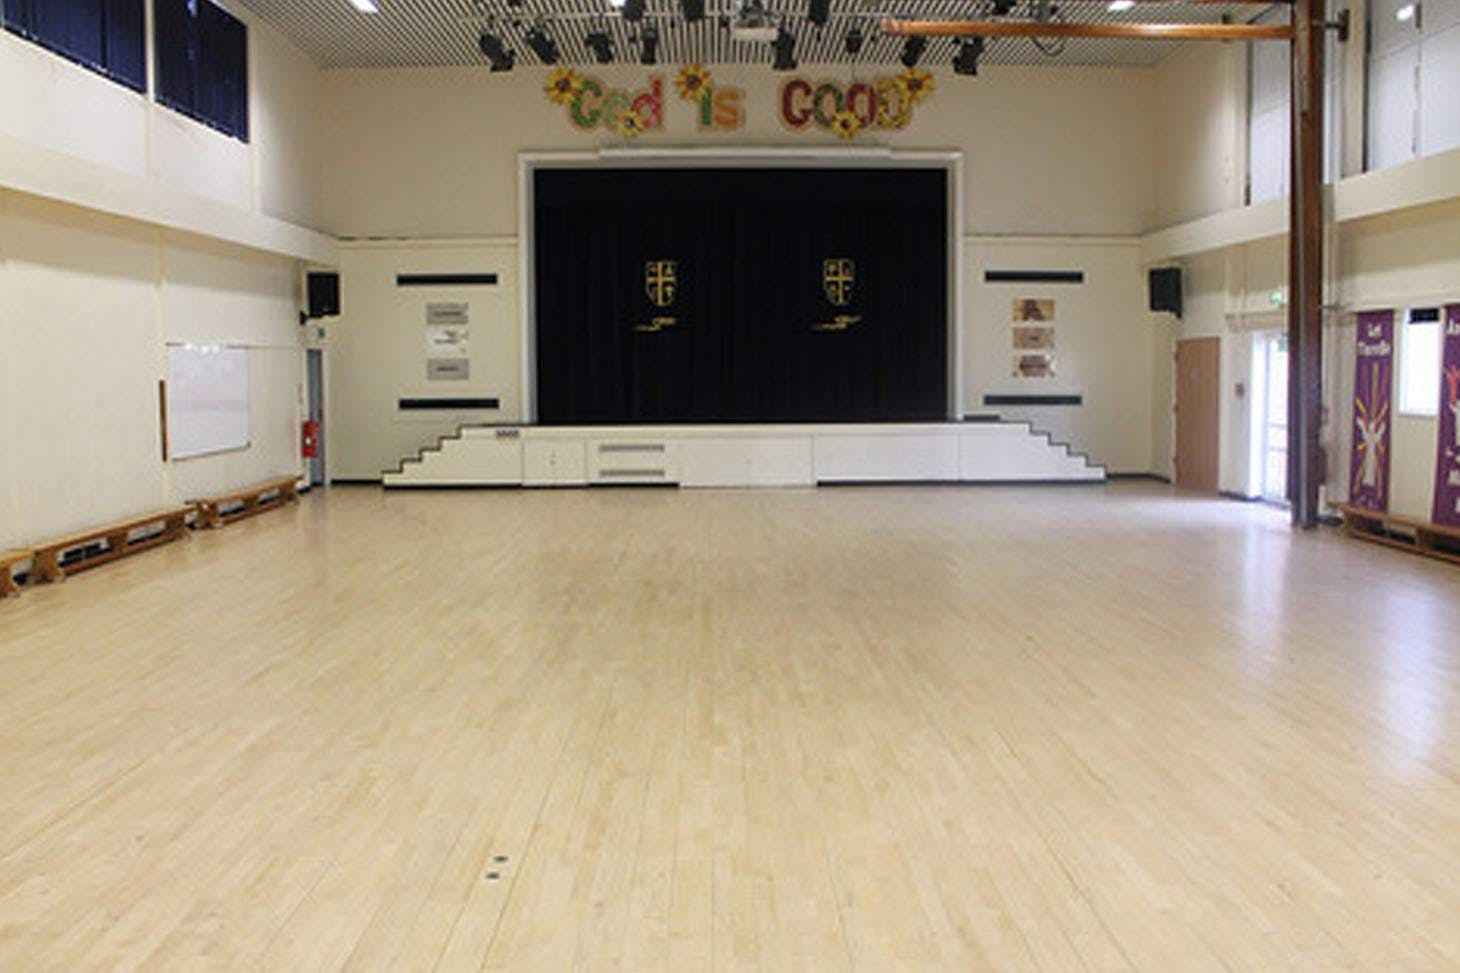 St. James's C of E High School Theatre space hire